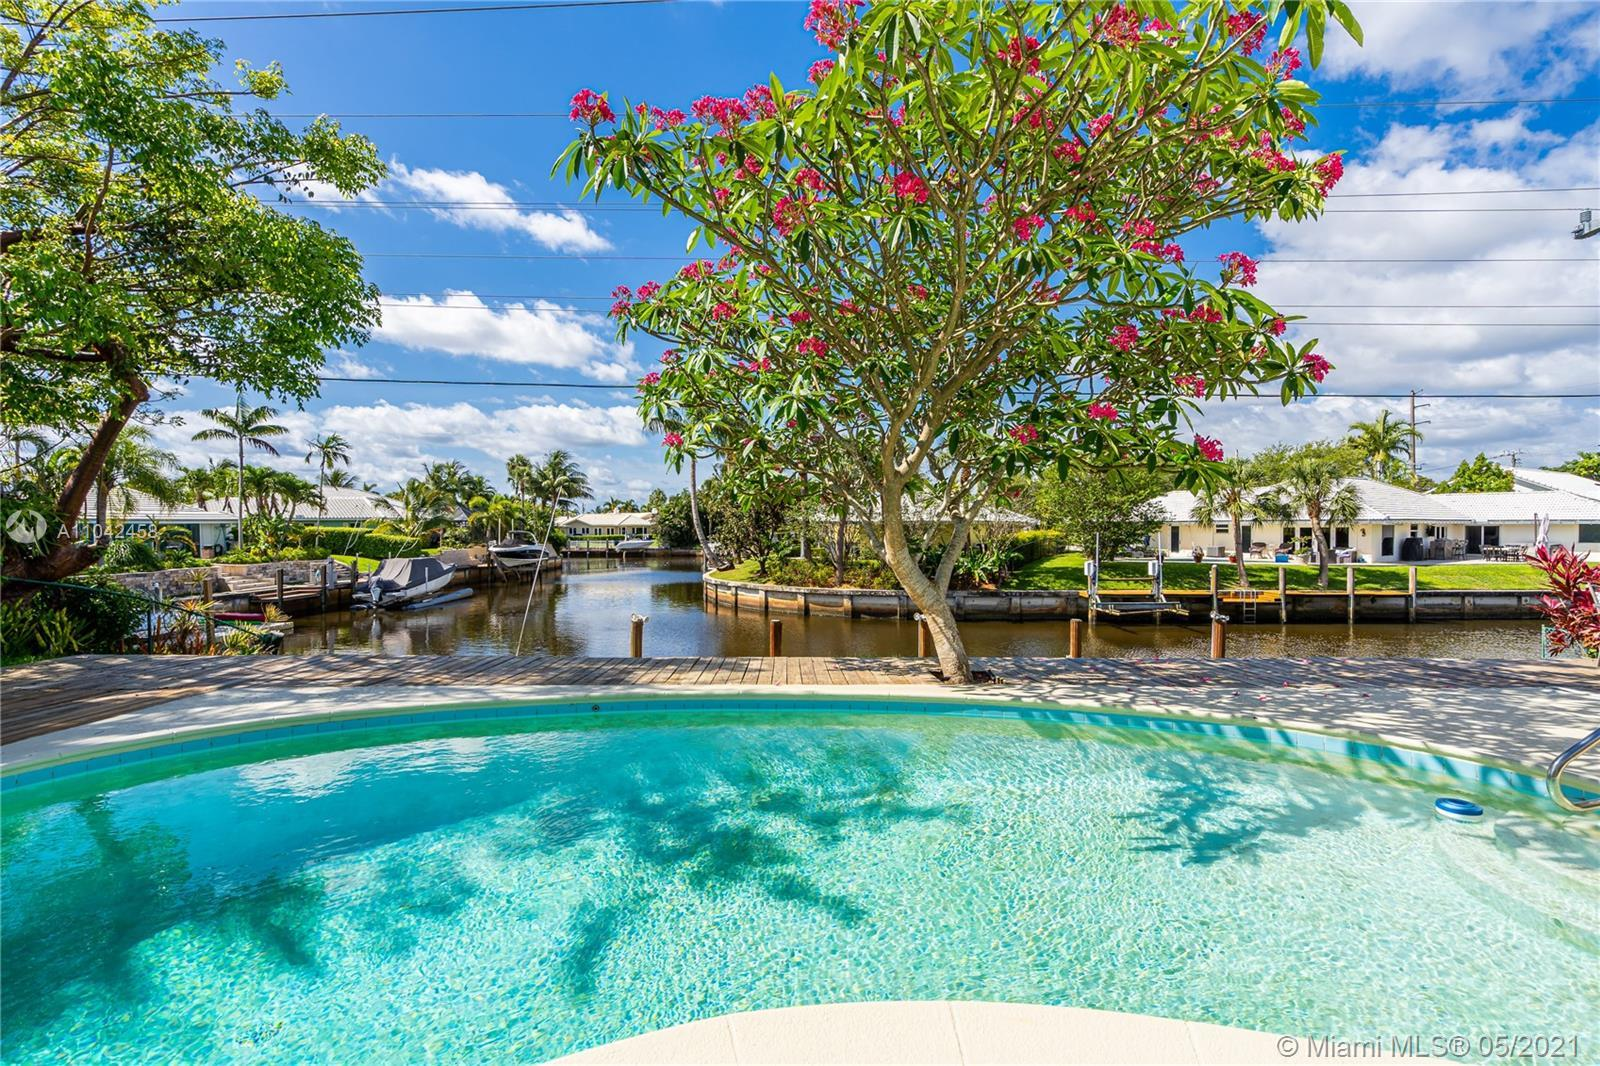 Boater Dream House - Large Waterfront lot bordering the prestigious Camino Gardens Community - Locat